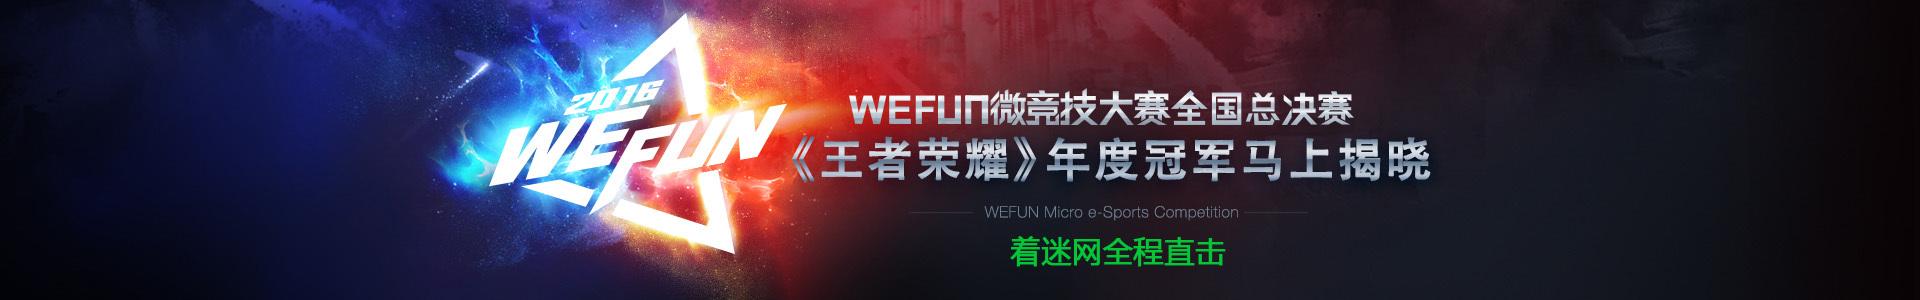 2016WEFUN微竞技大赛全国总决赛--着迷网直播